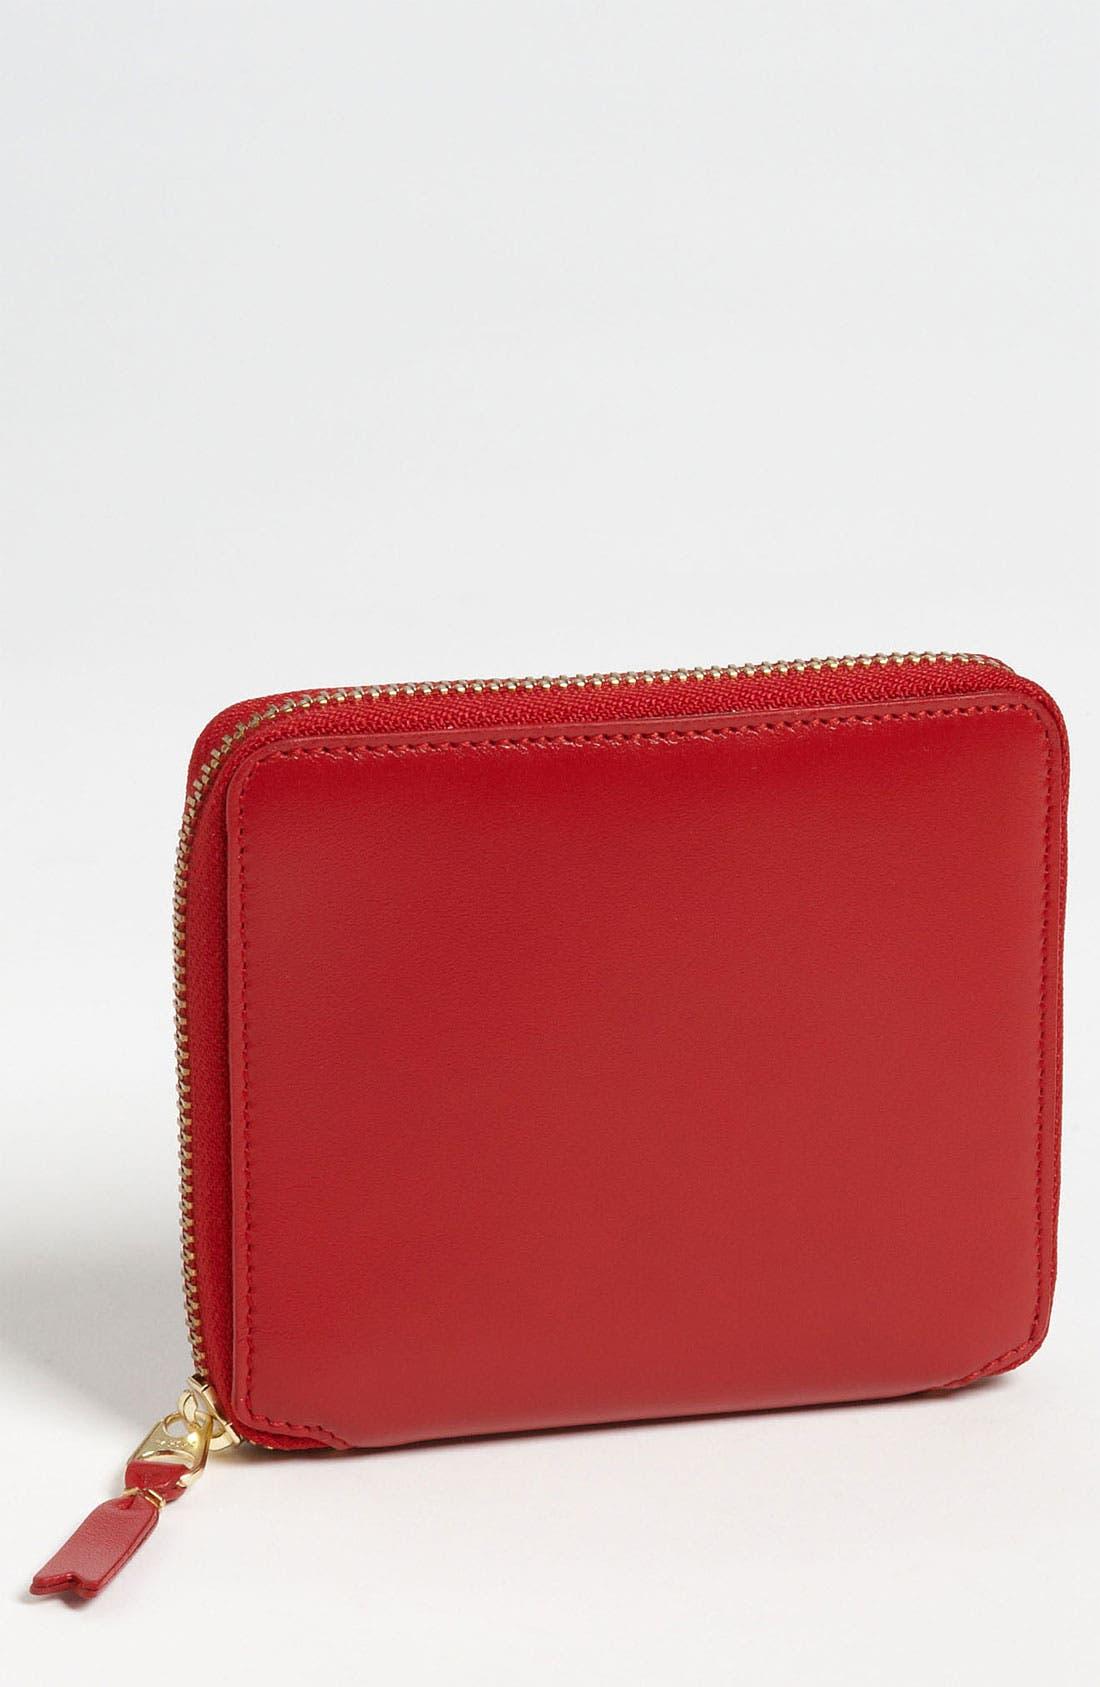 Alternate Image 1 Selected - Comme des Garçons 'Classic' French Wallet